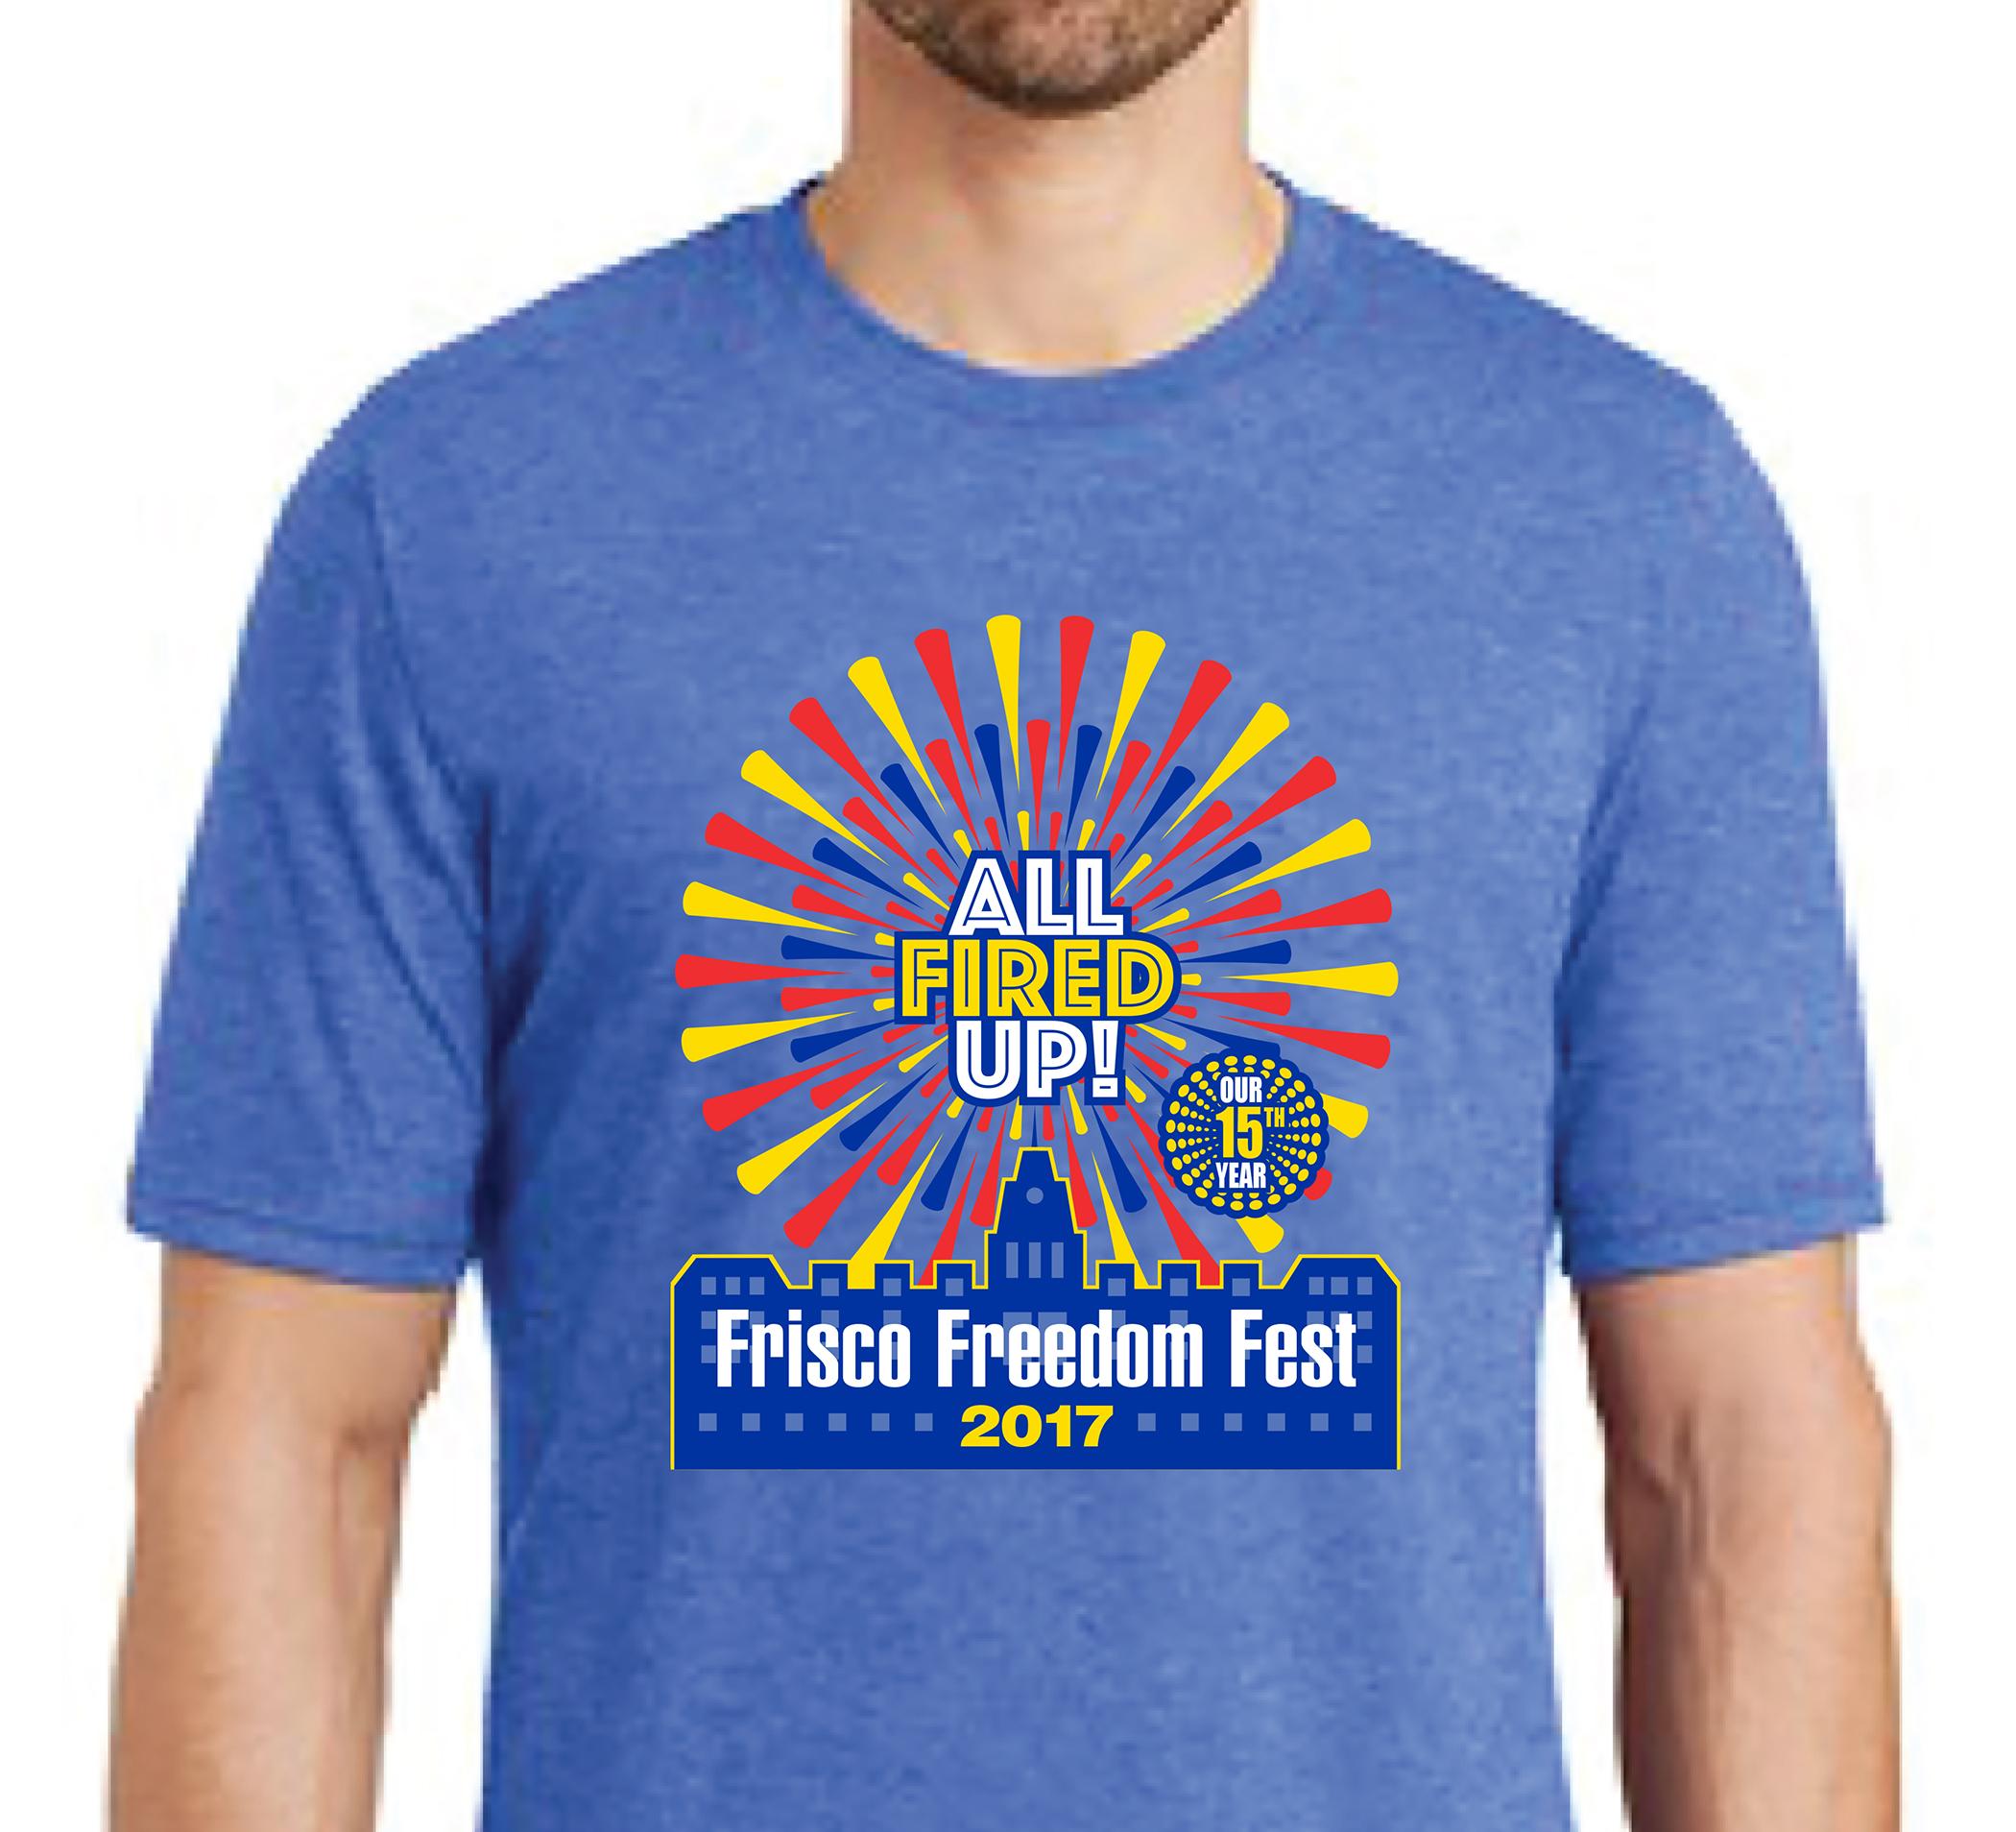 FFF-Tshirt-mockup-for-web.jpg